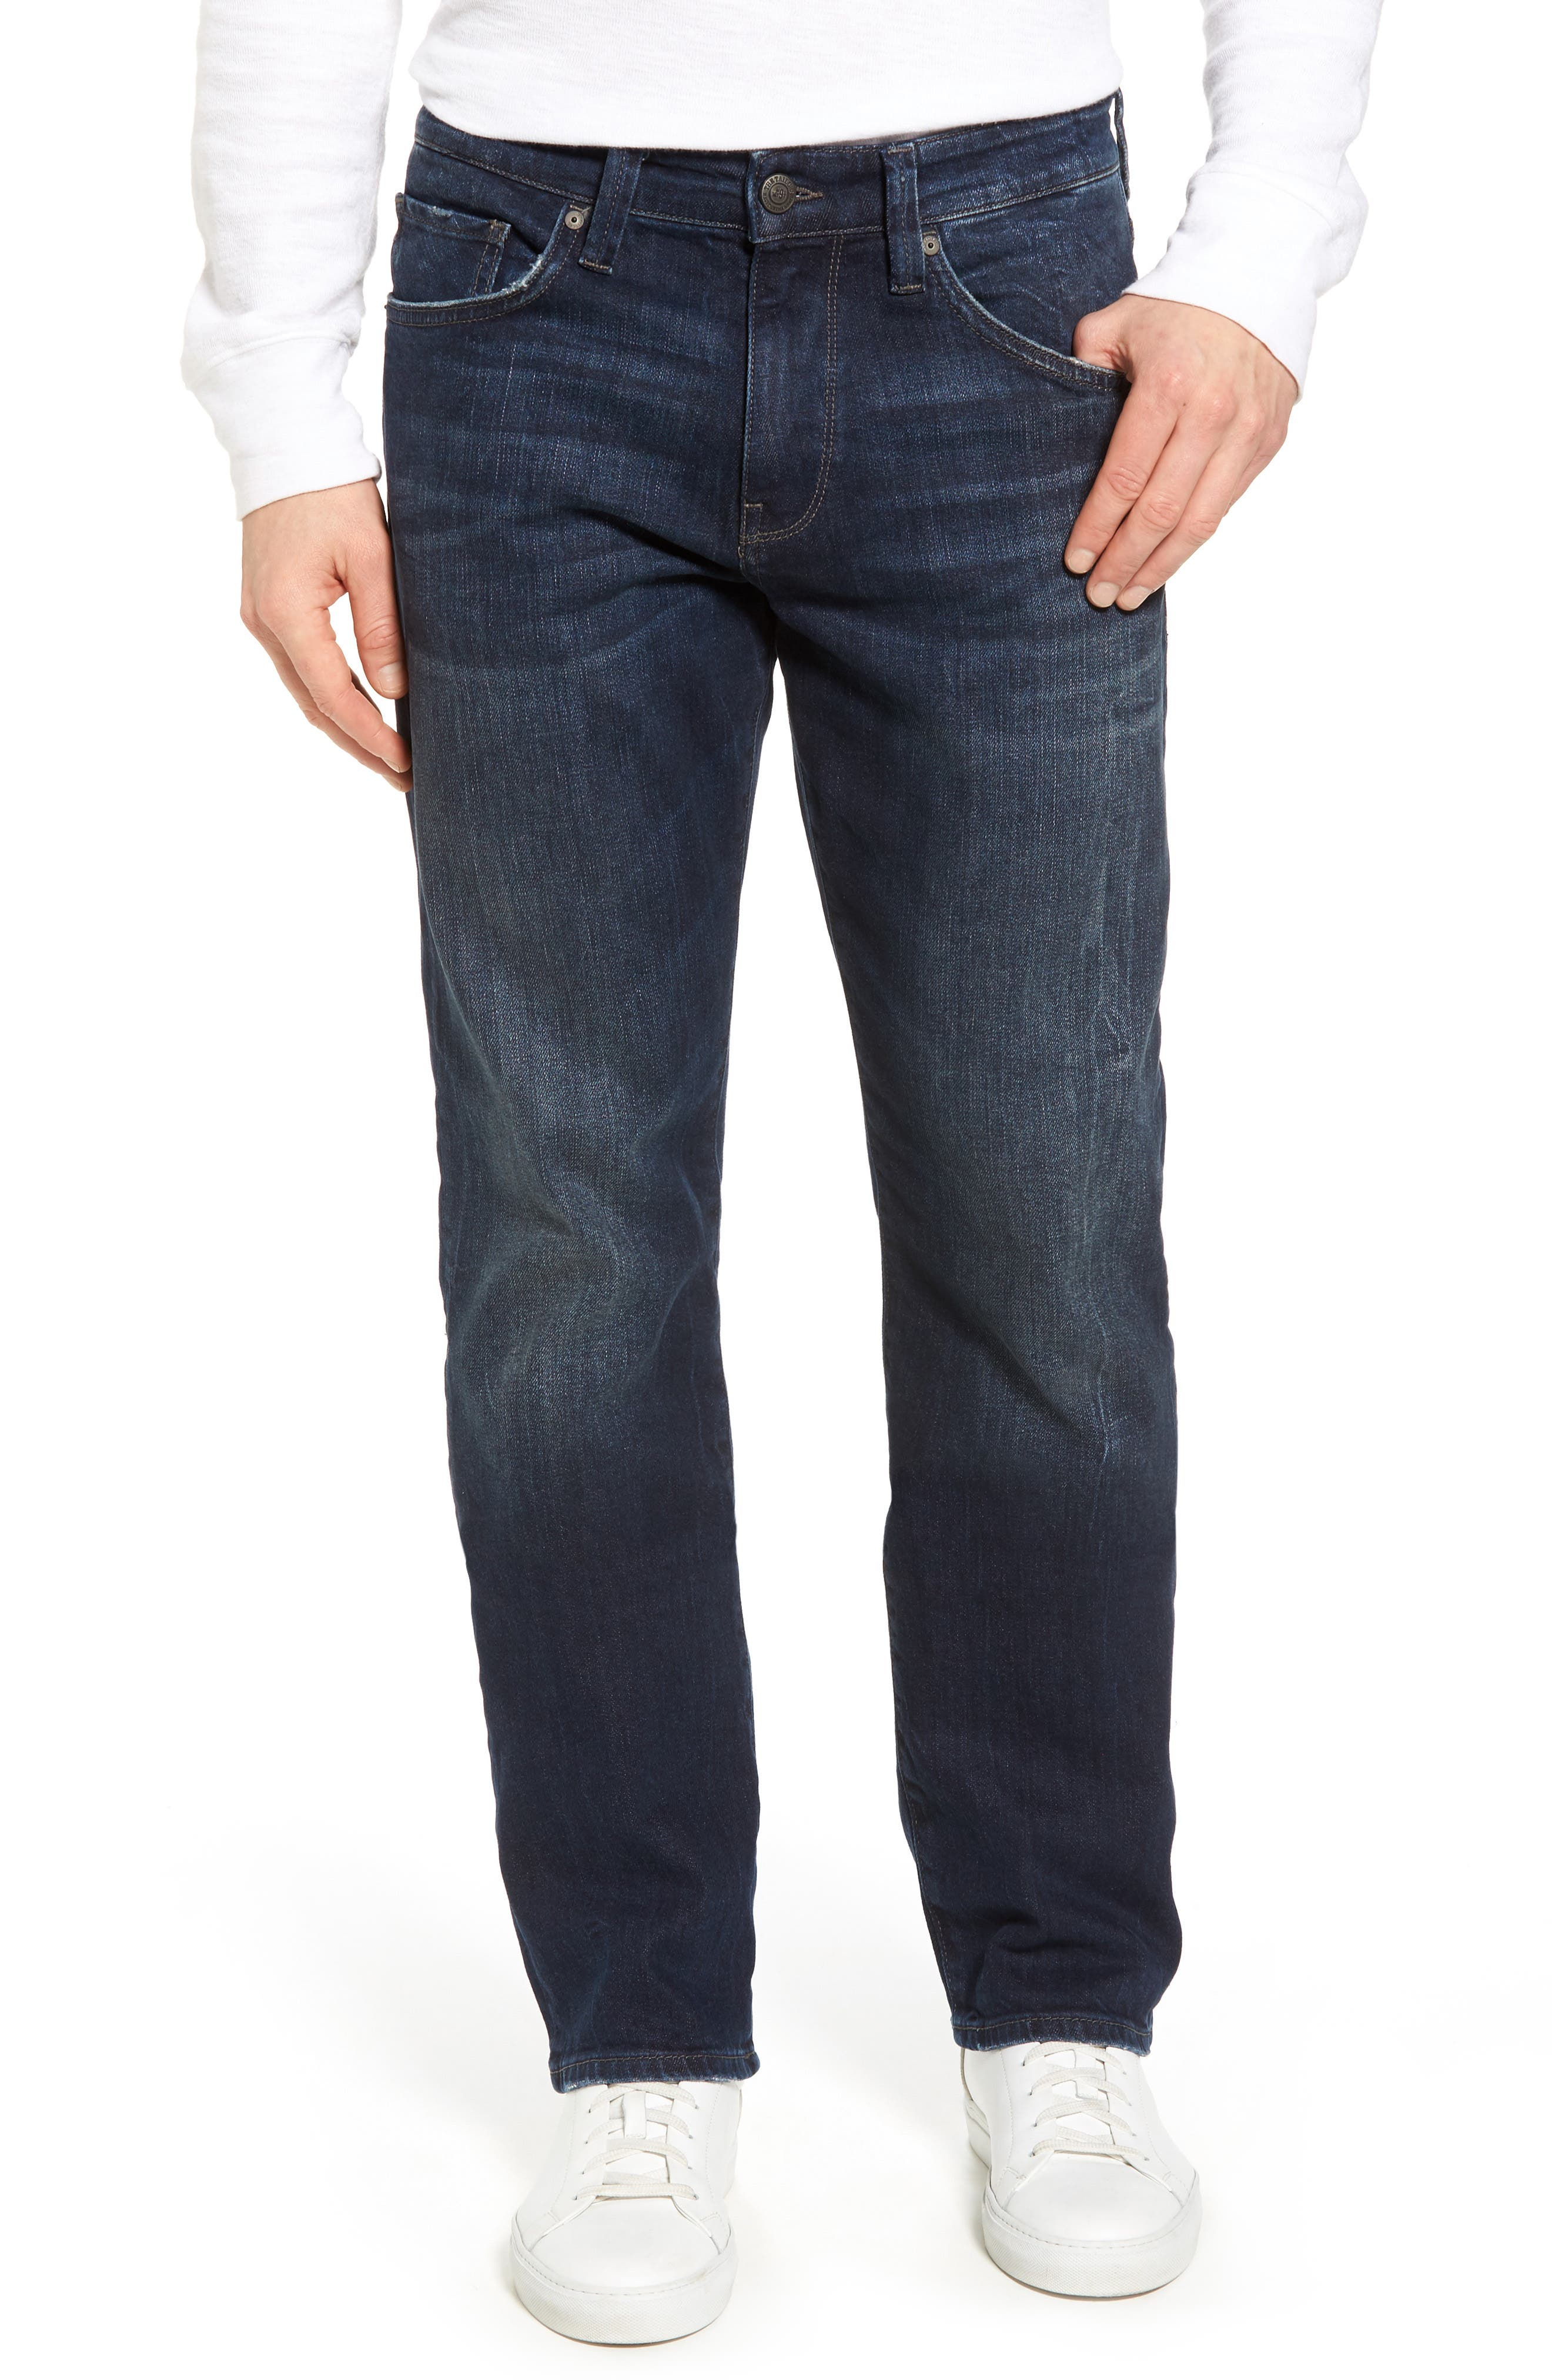 Myles Straight Leg Jeans,                         Main,                         color, Deep Brooklyn